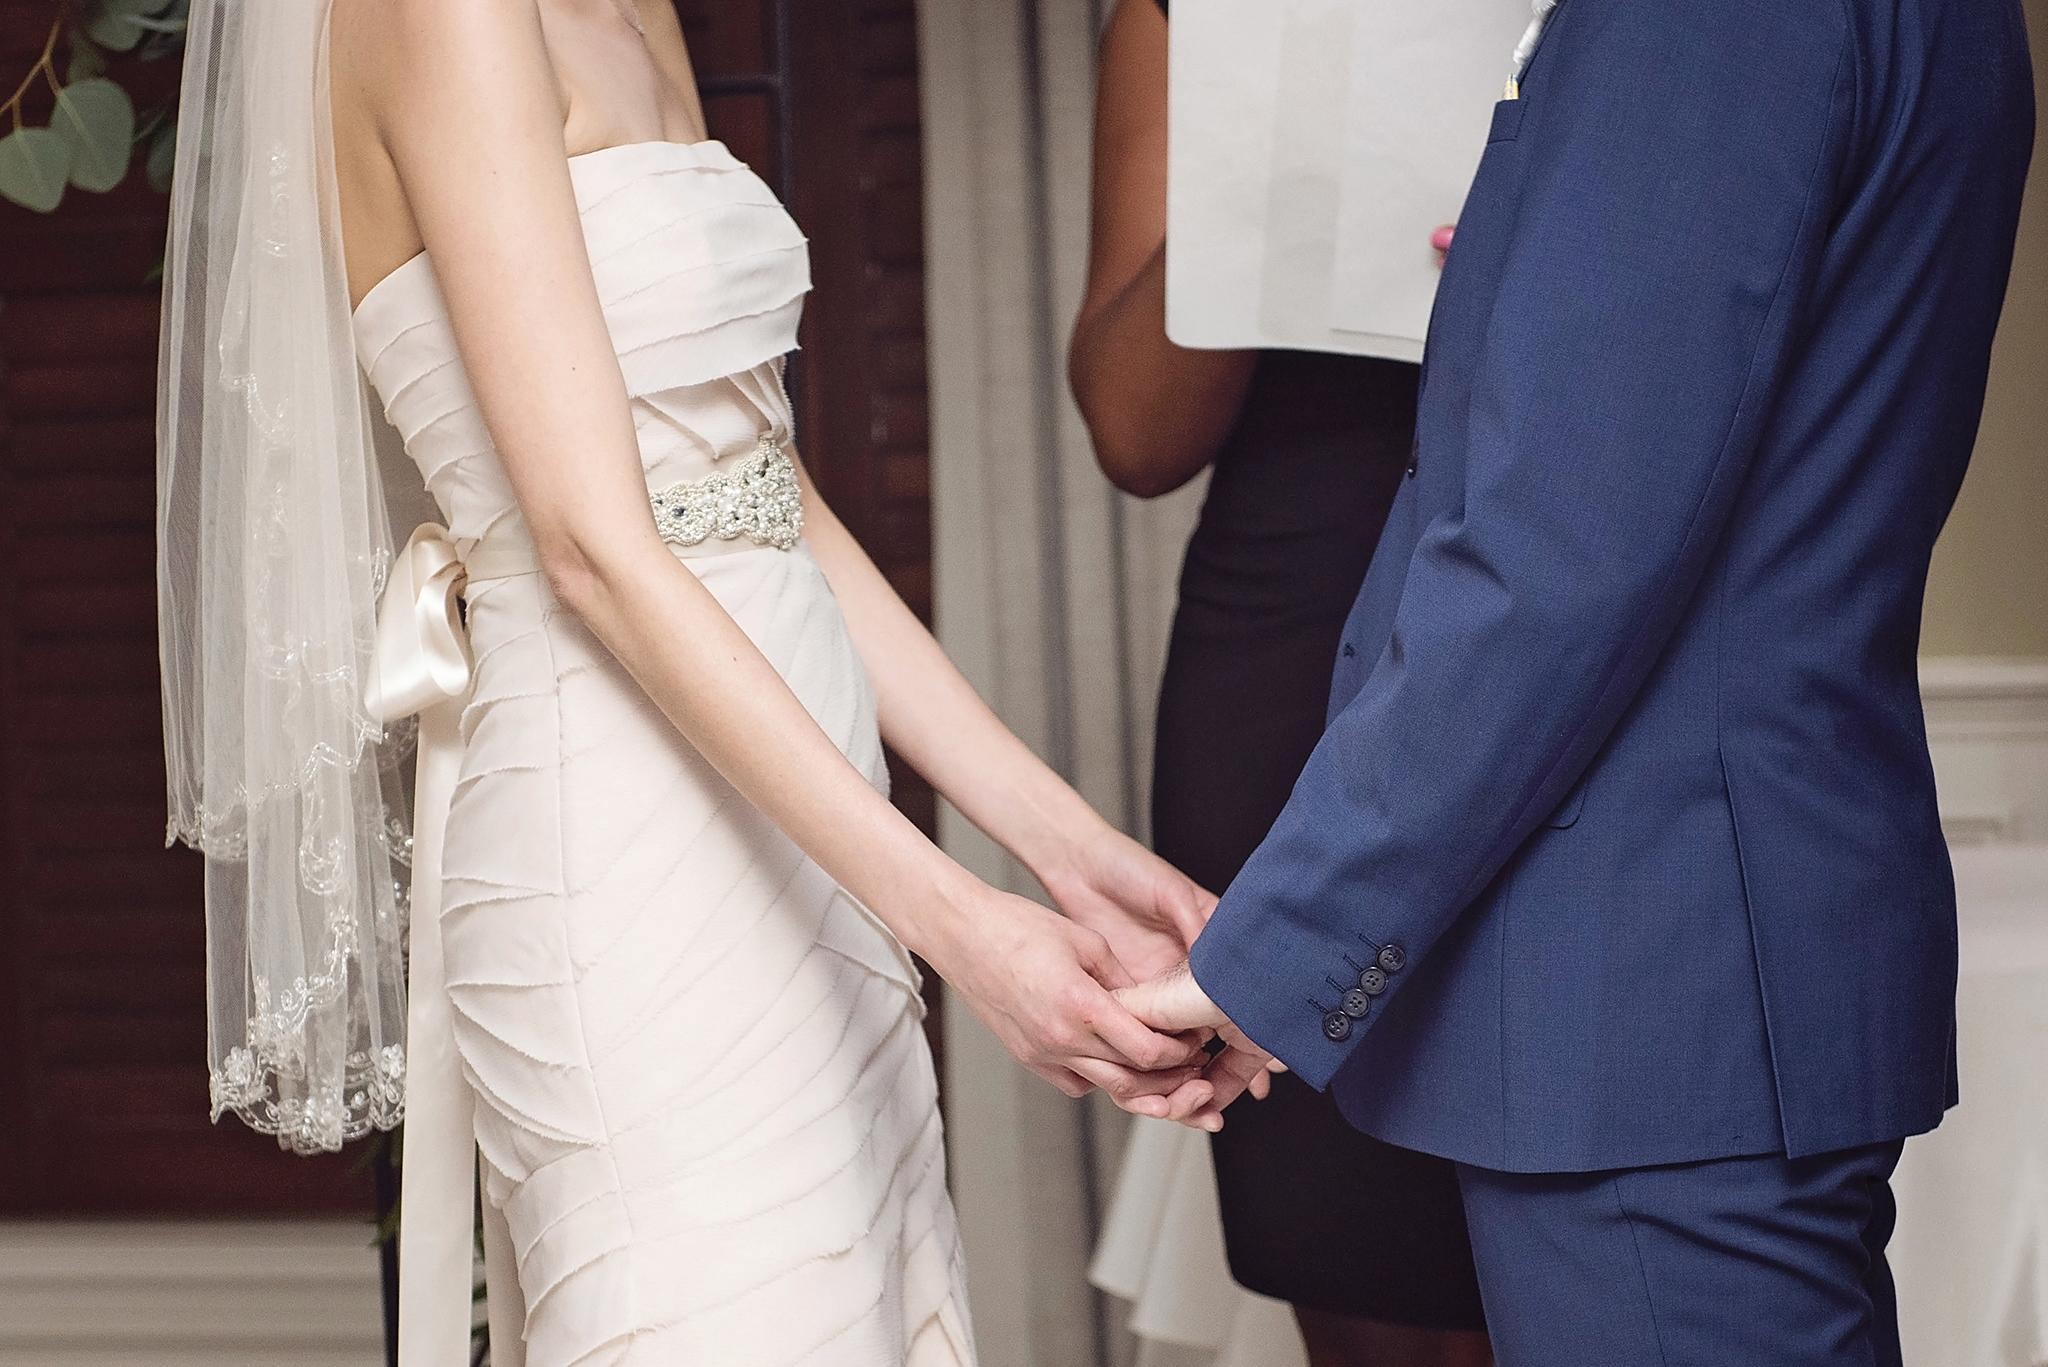 NJ-NY-wedding-photographer-046NJ-NY-wedding-photographer-046NJ-NY-WEDDING-PHOTOGRAPHER-046.JPG